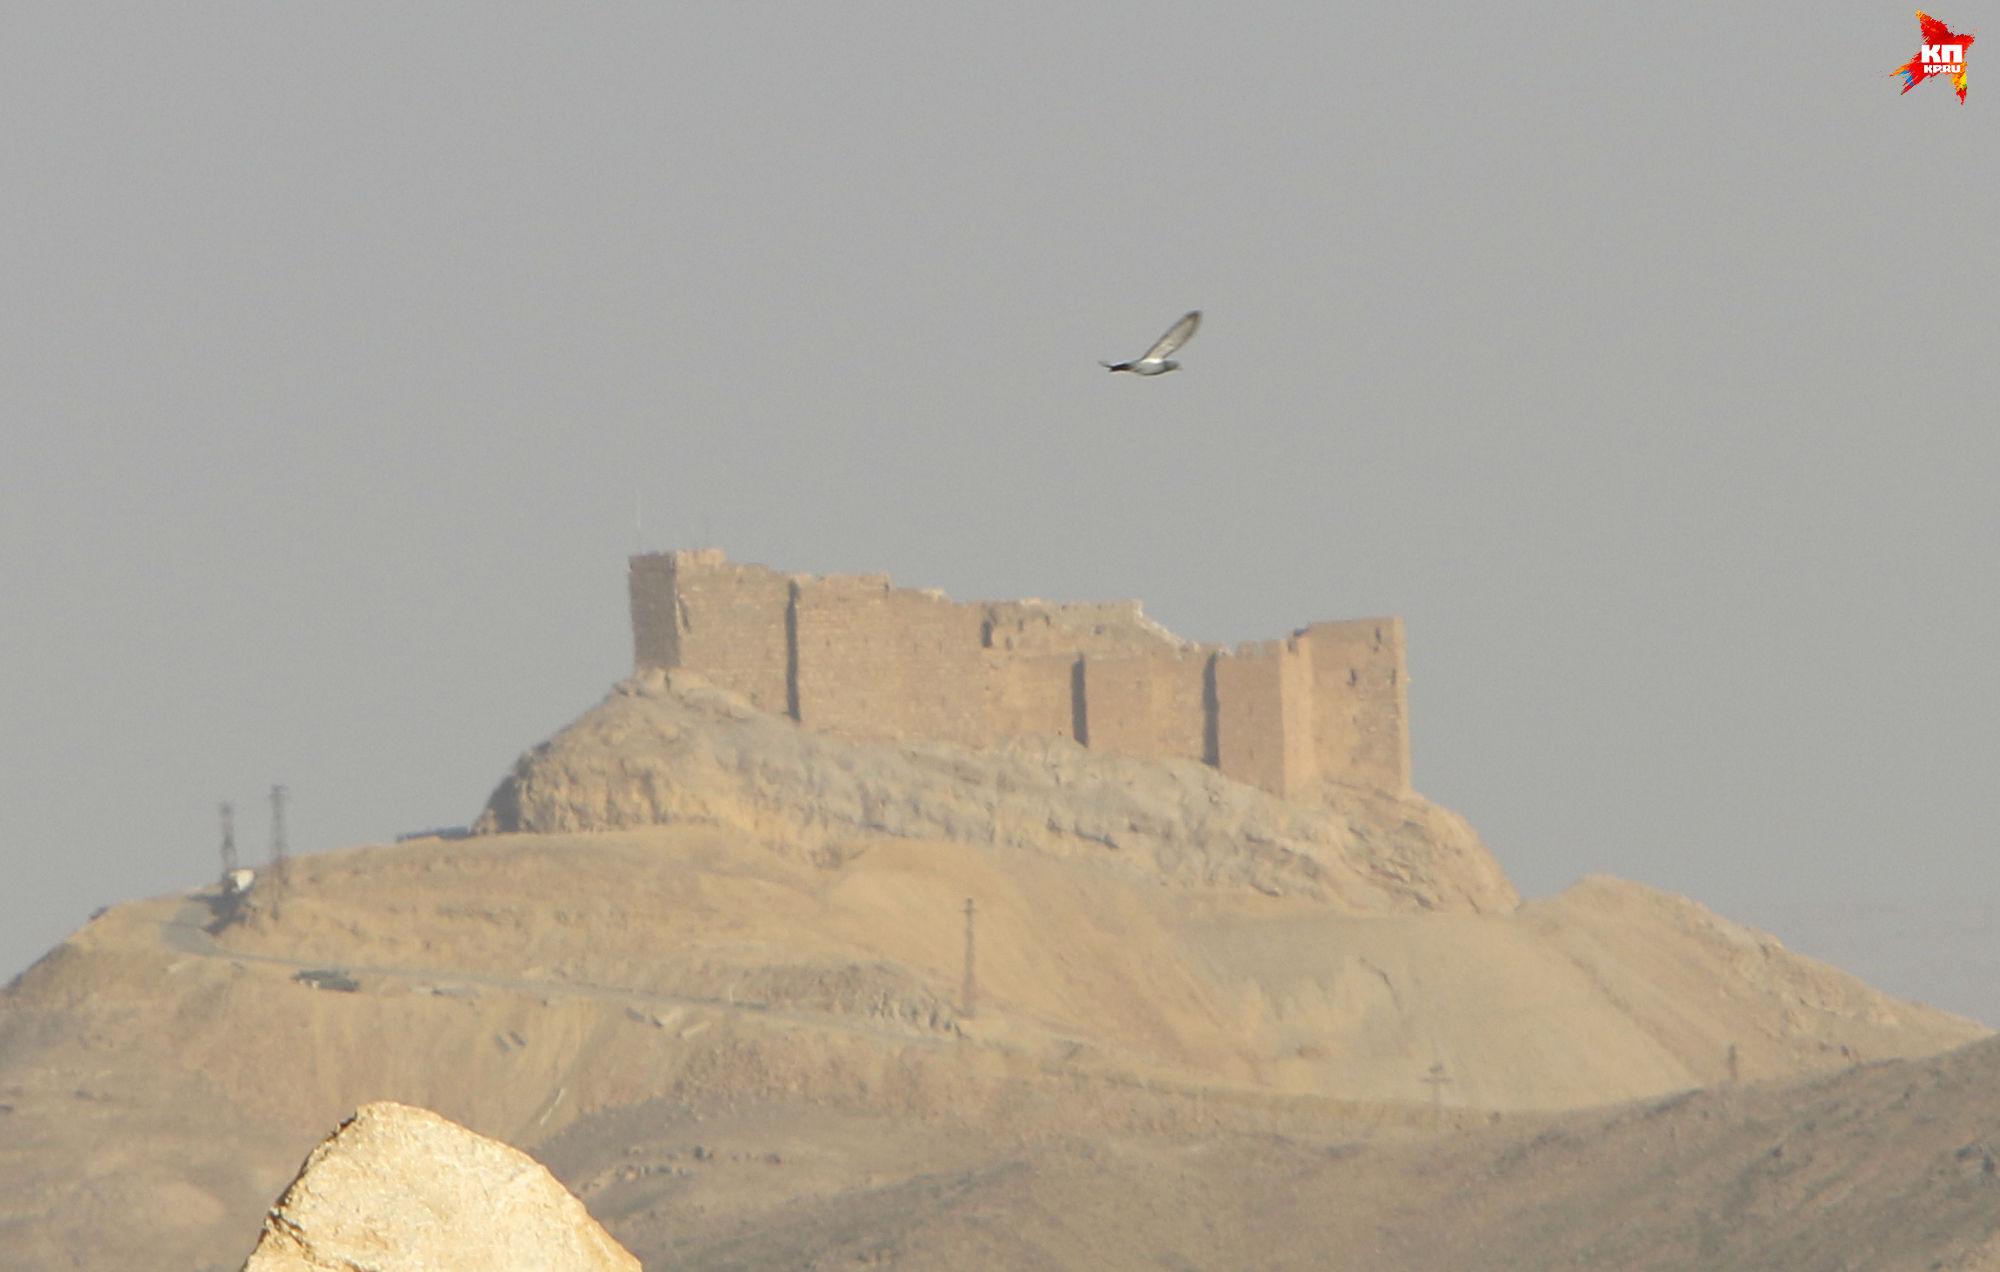 Сторожевая крепость над Пальмирой. Фото: Александр КОЦ, Дмитрий СТЕШИН